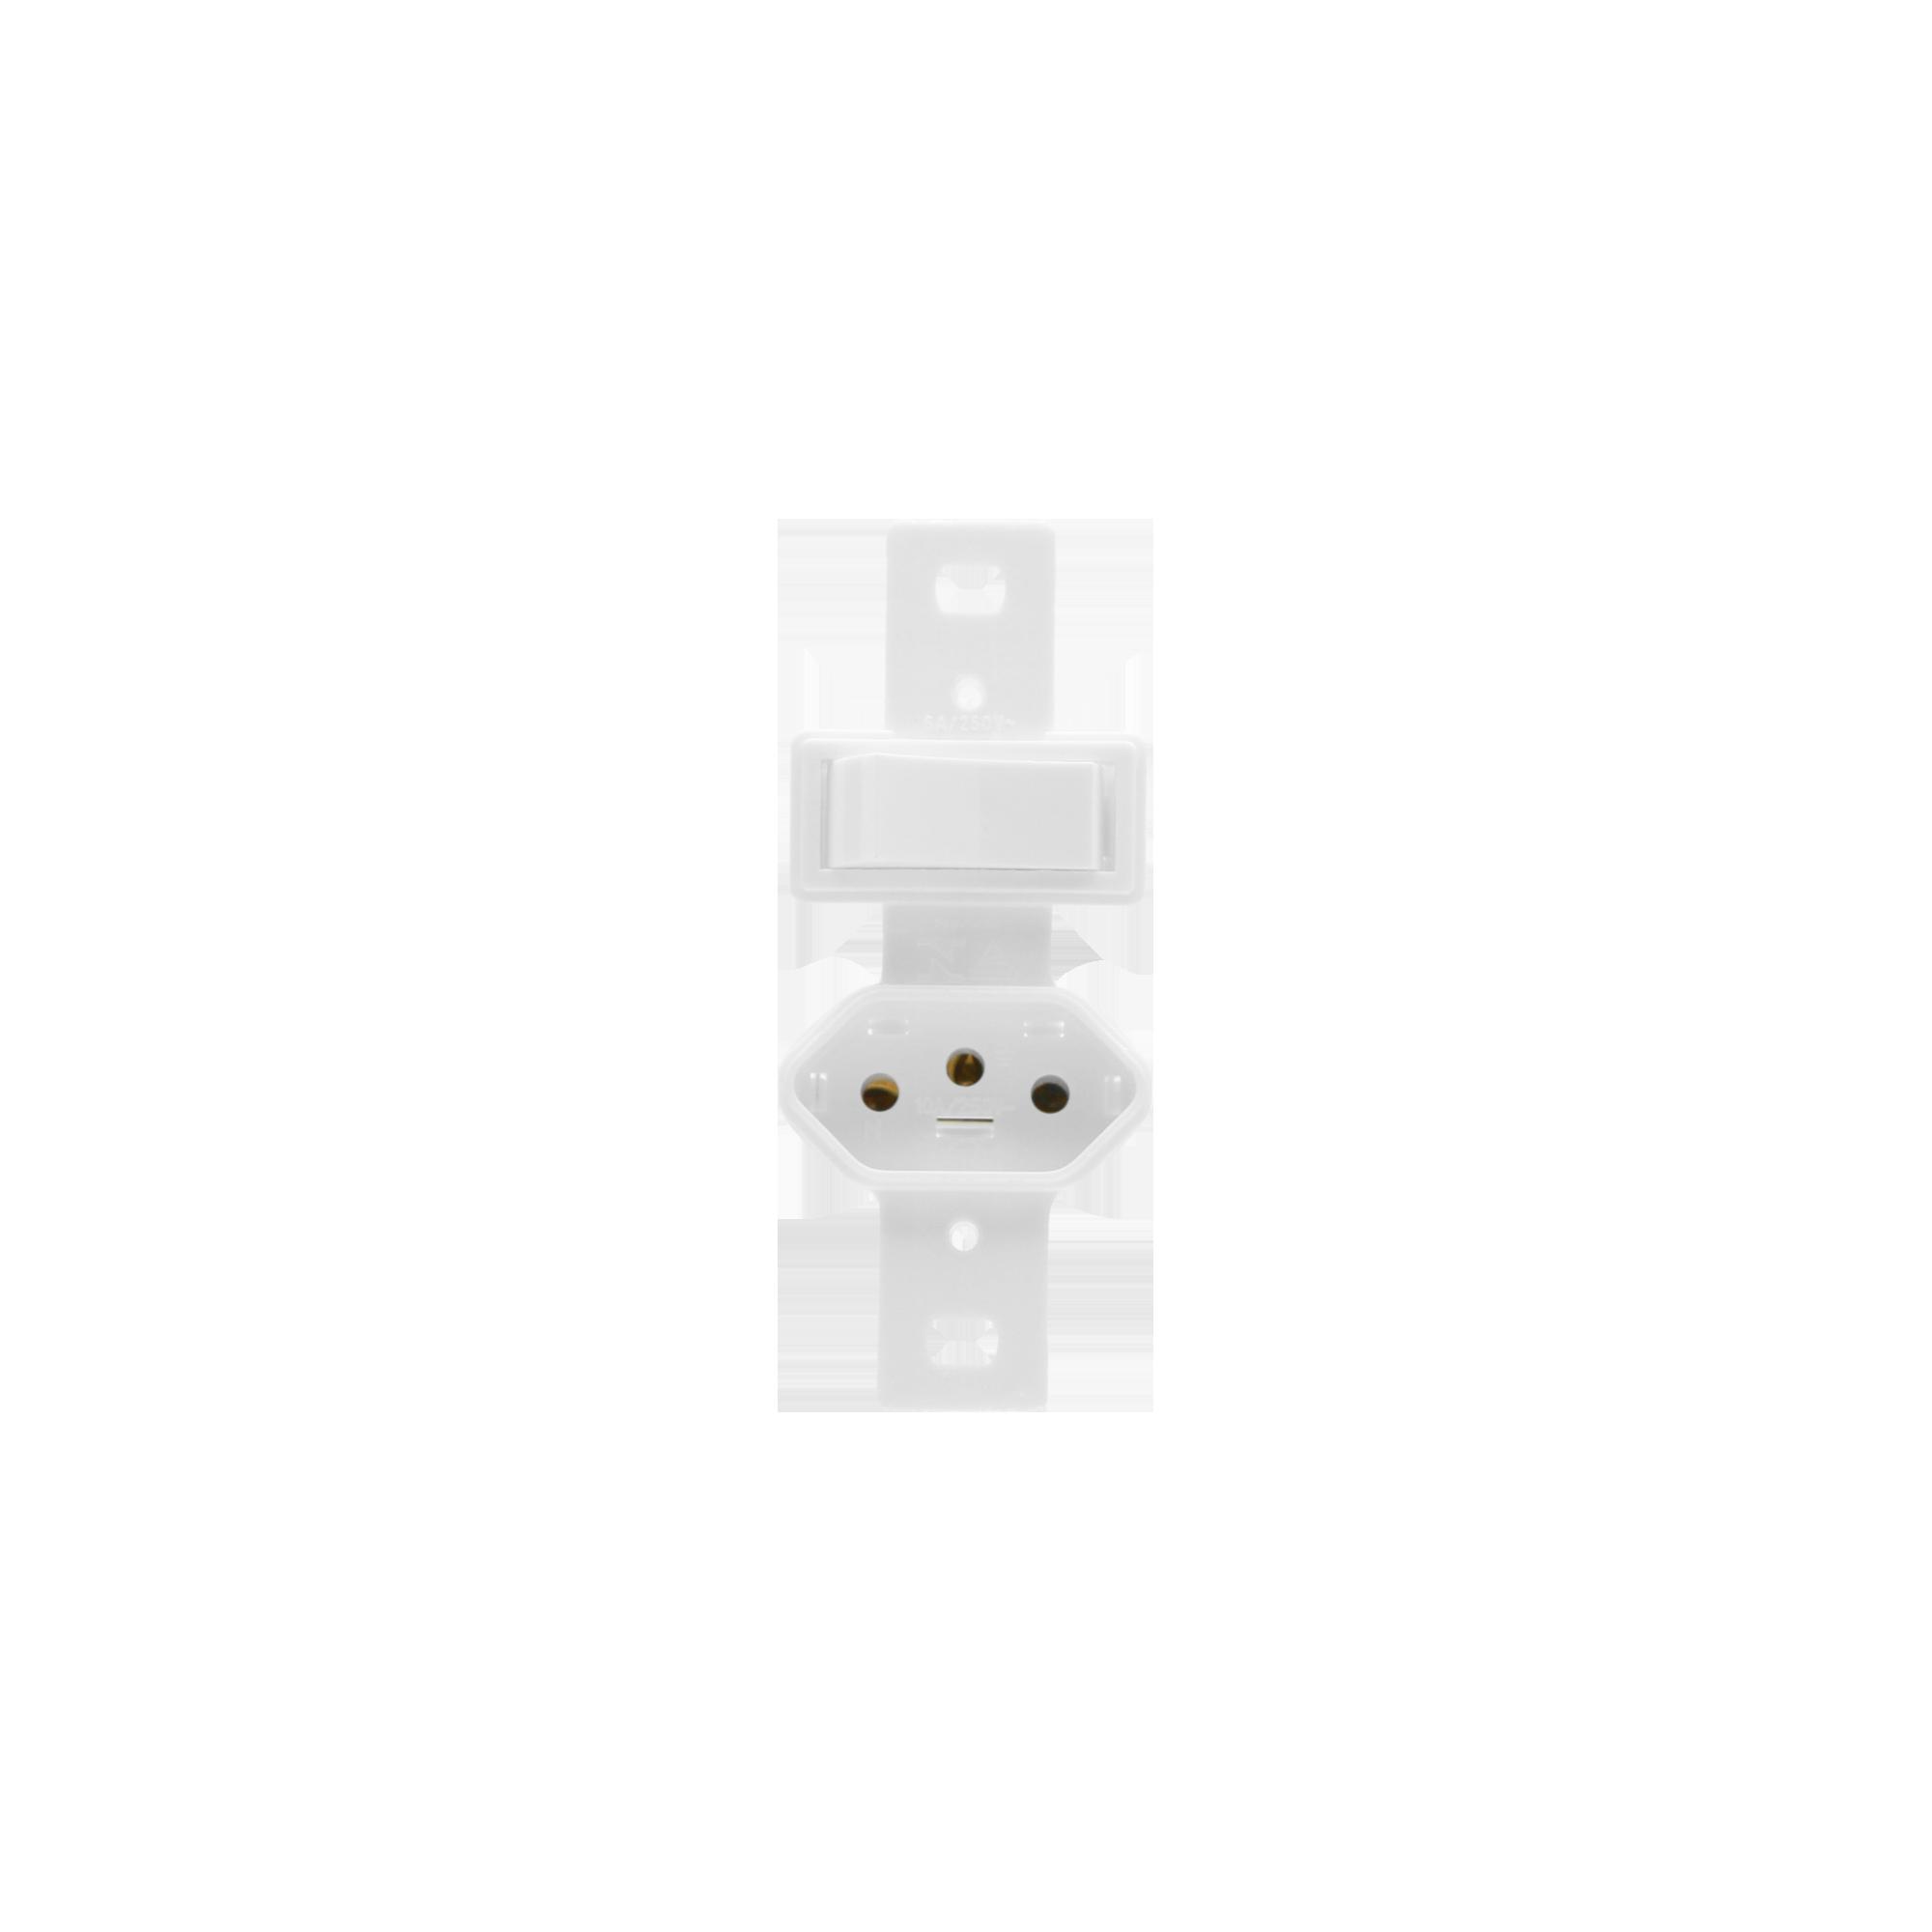 Interruptor Paralelo + Tomada 20280/0 Ilumi